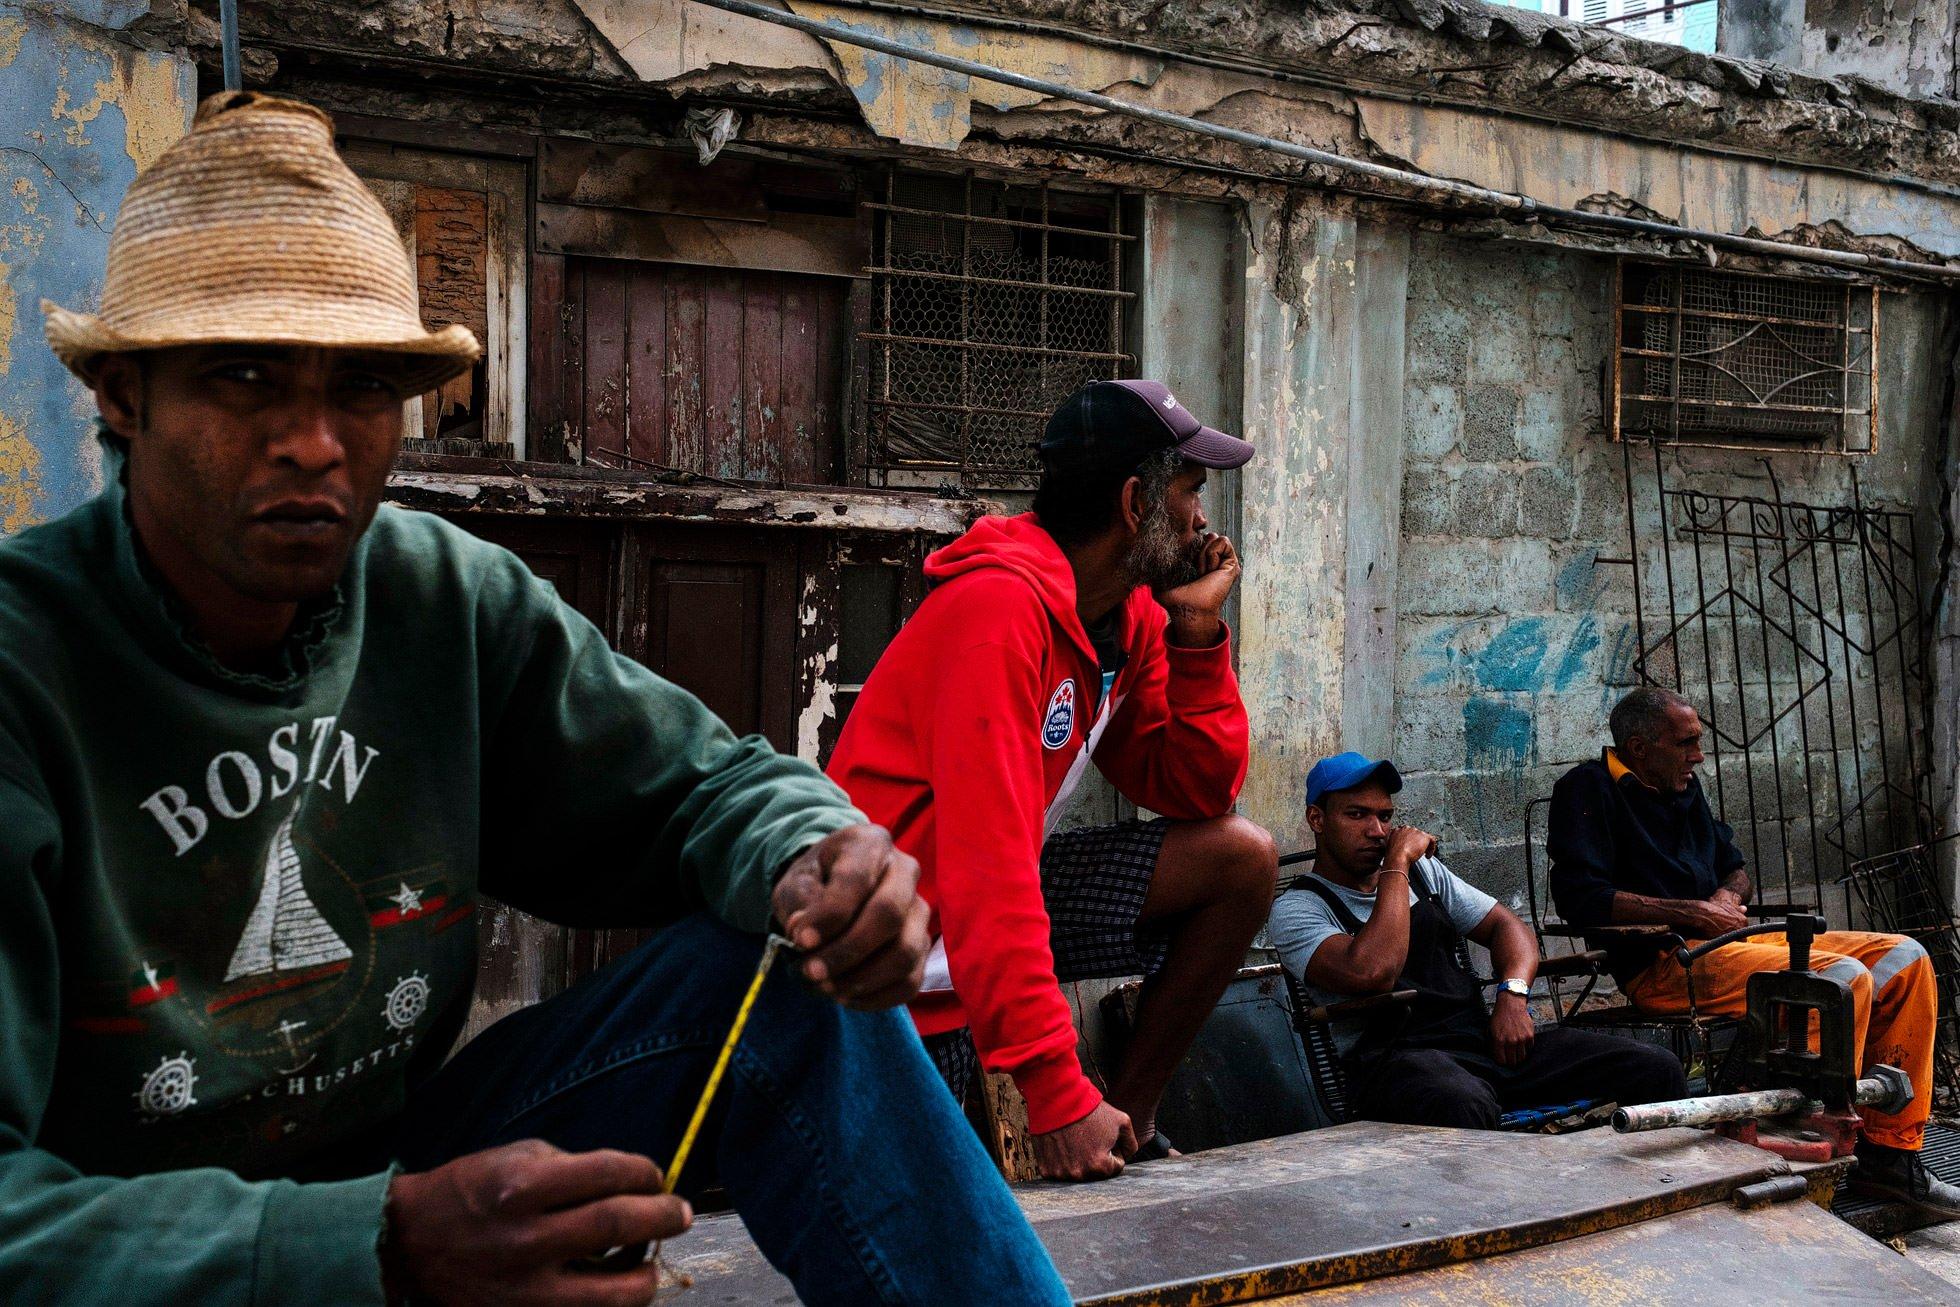 cuba street photography group of men